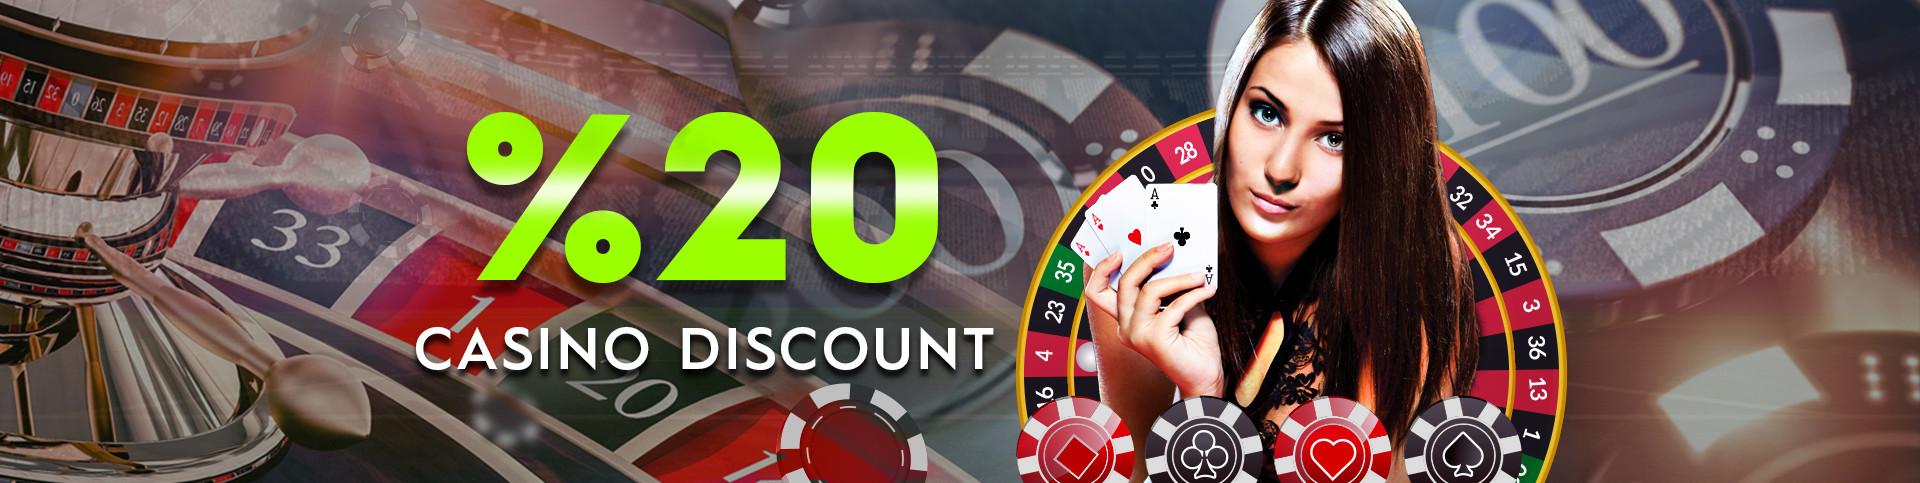 Noktabet- %20 Discount